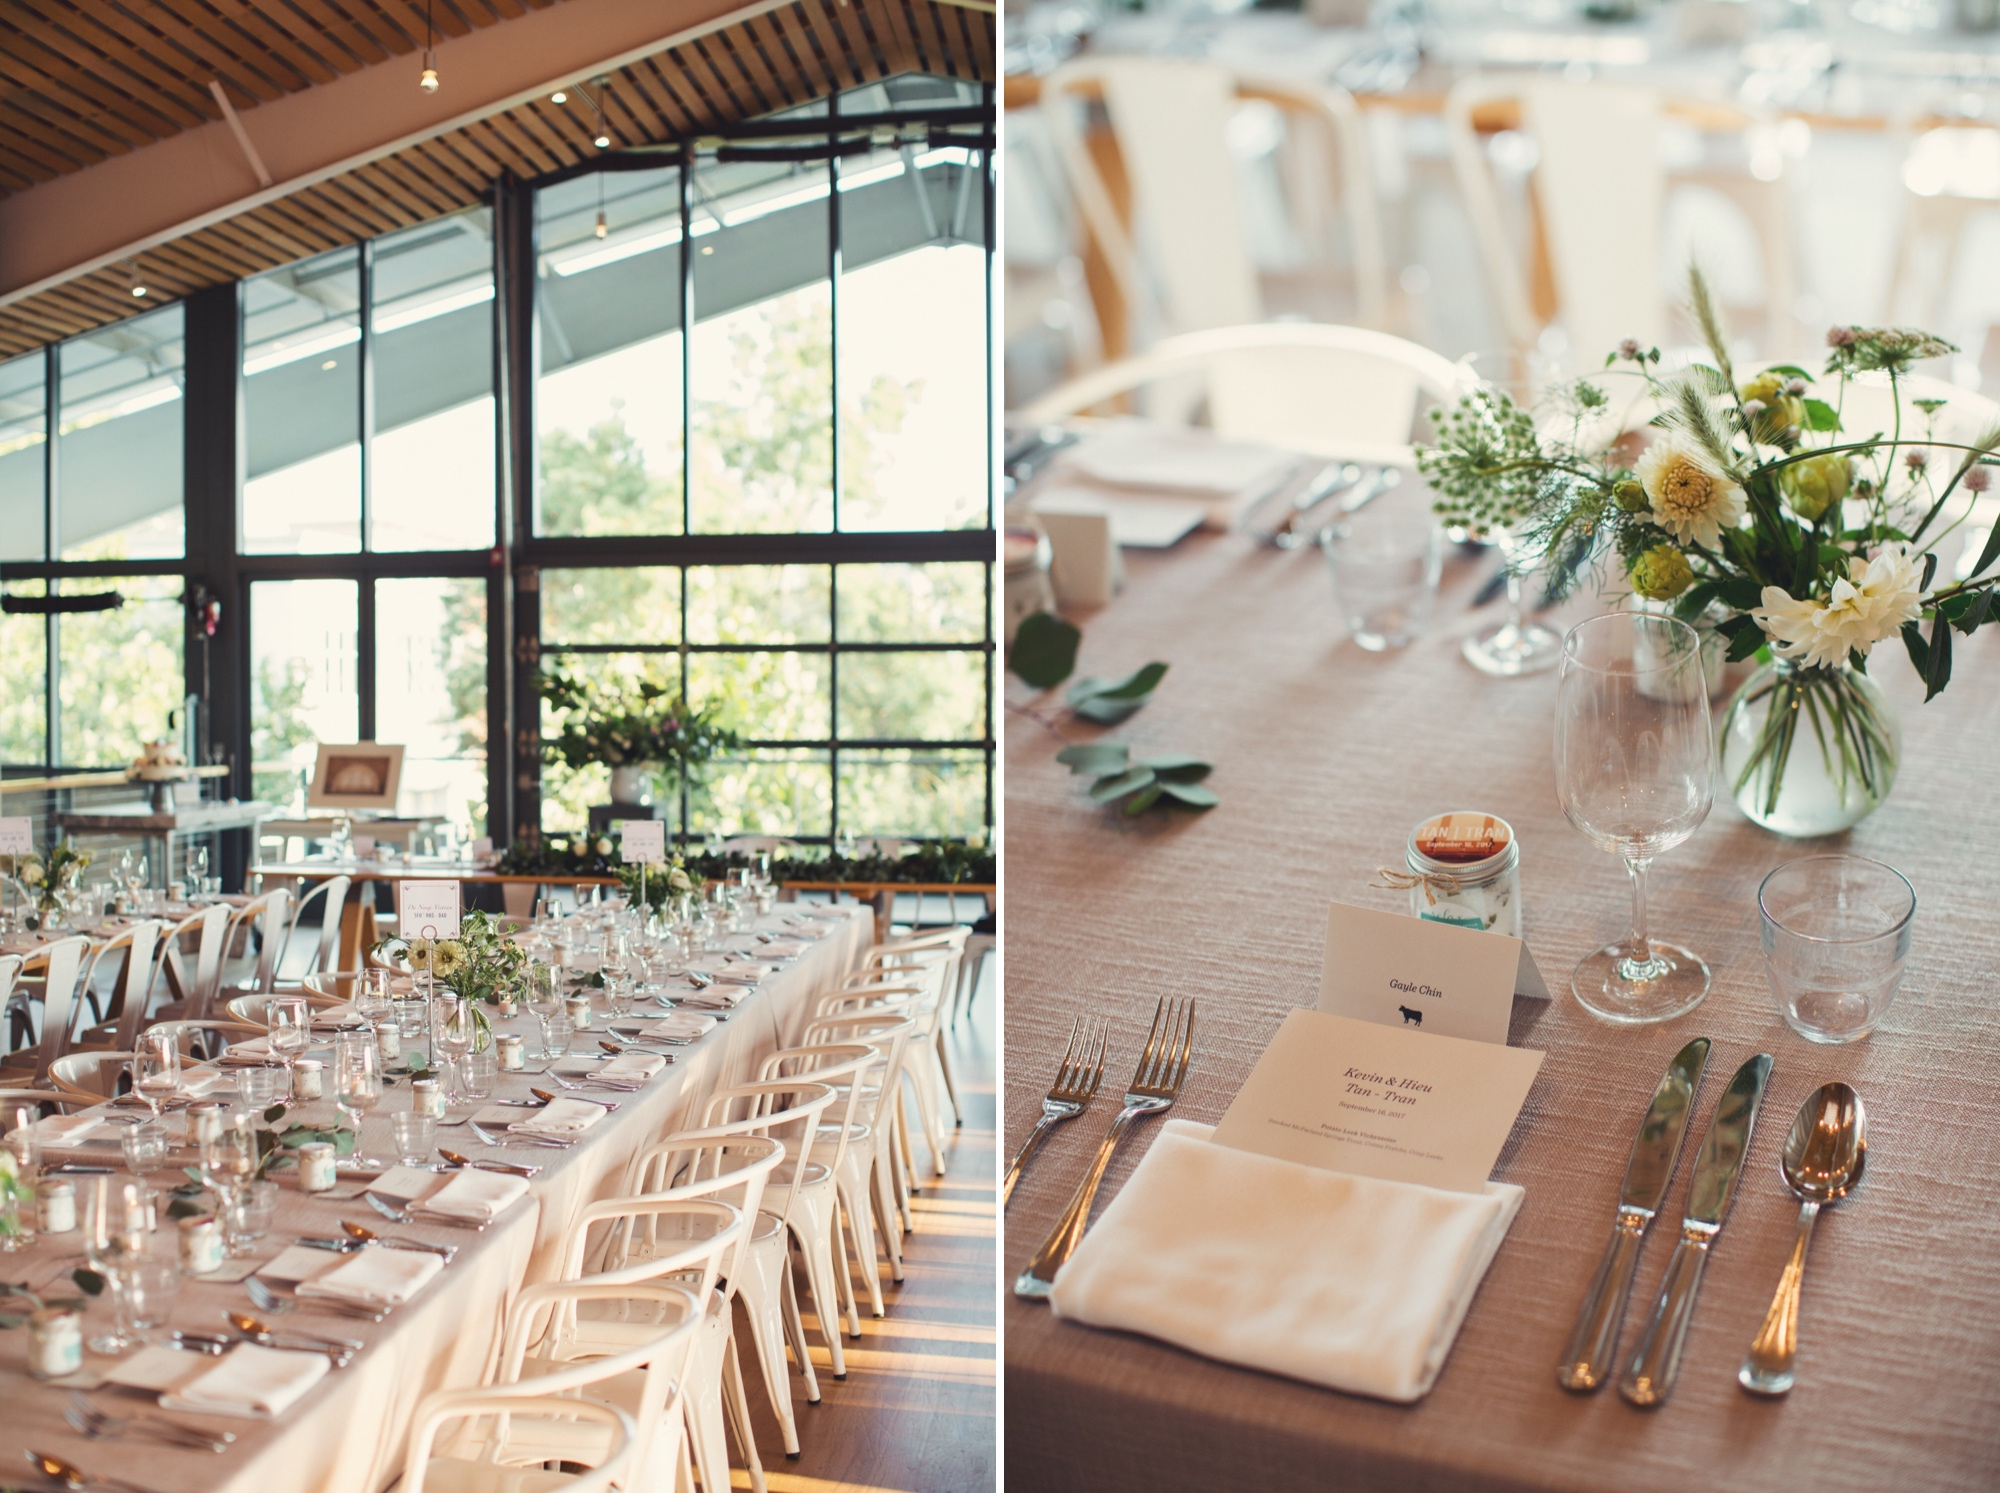 The Shed Healdsburg Wedding - Anne-Claire Brun